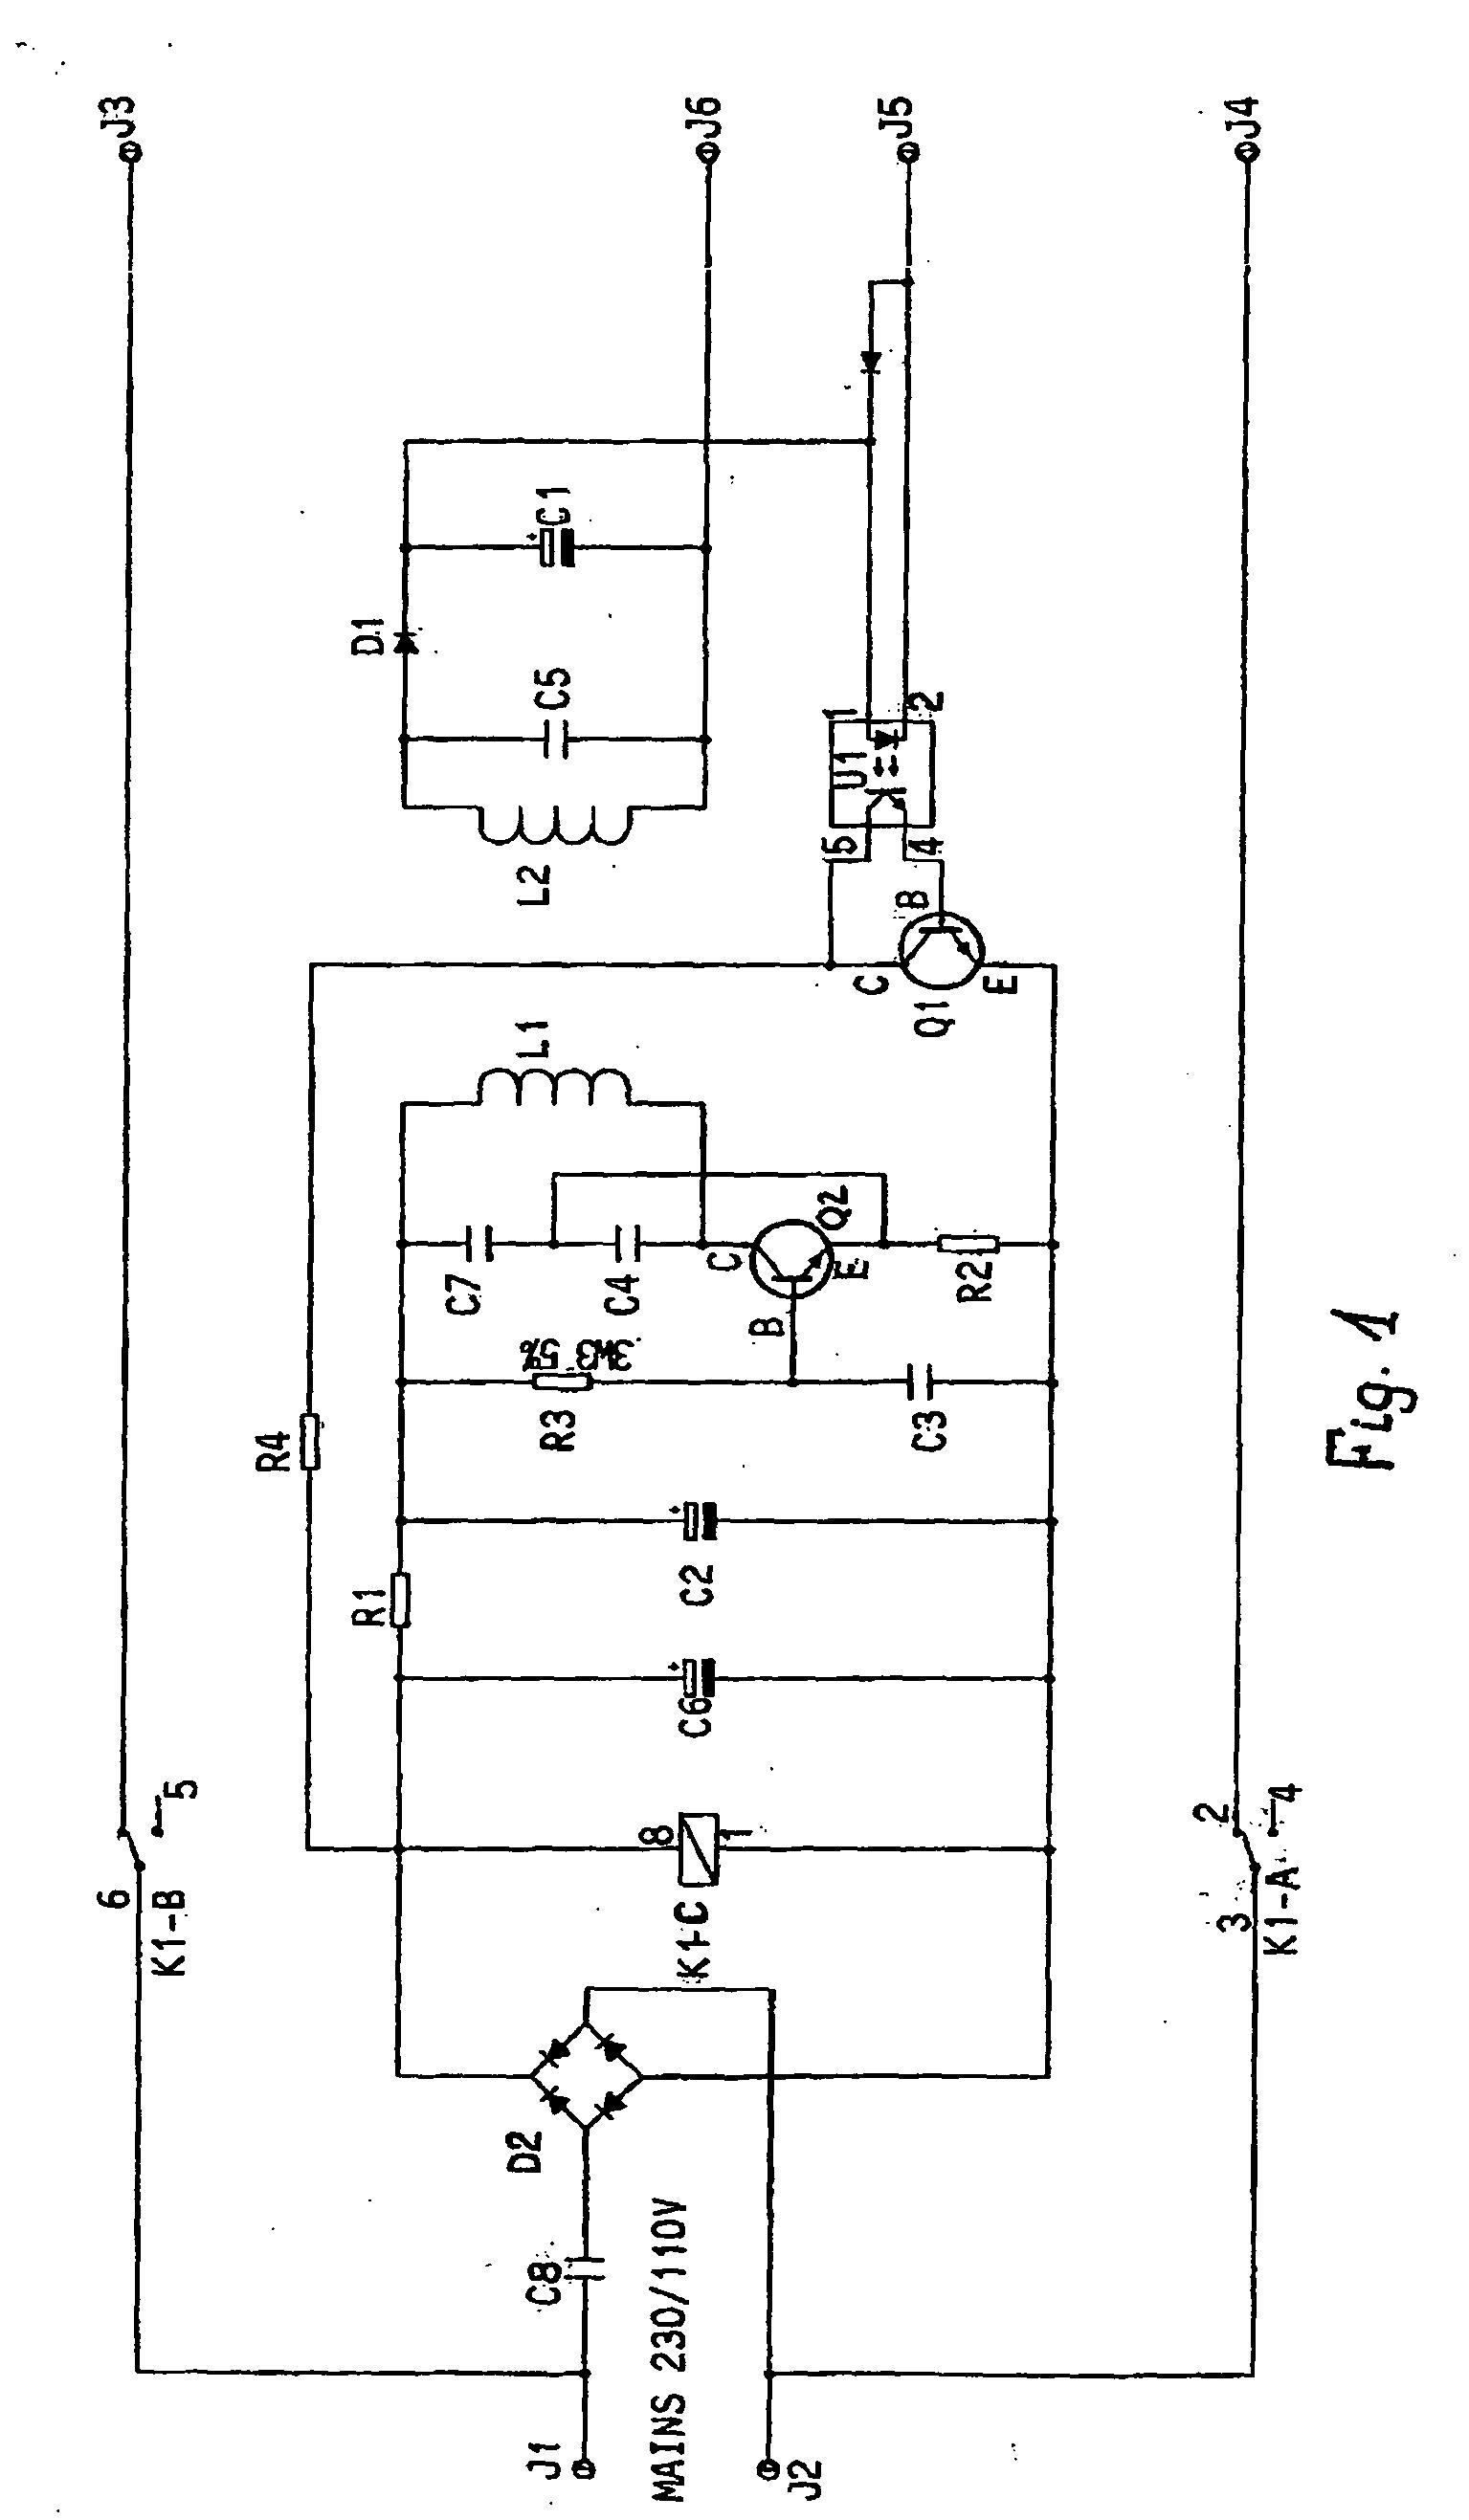 doerr electric motor wiring diagram danfoss zone valve okin : 25 images - diagrams | gsmportal.co